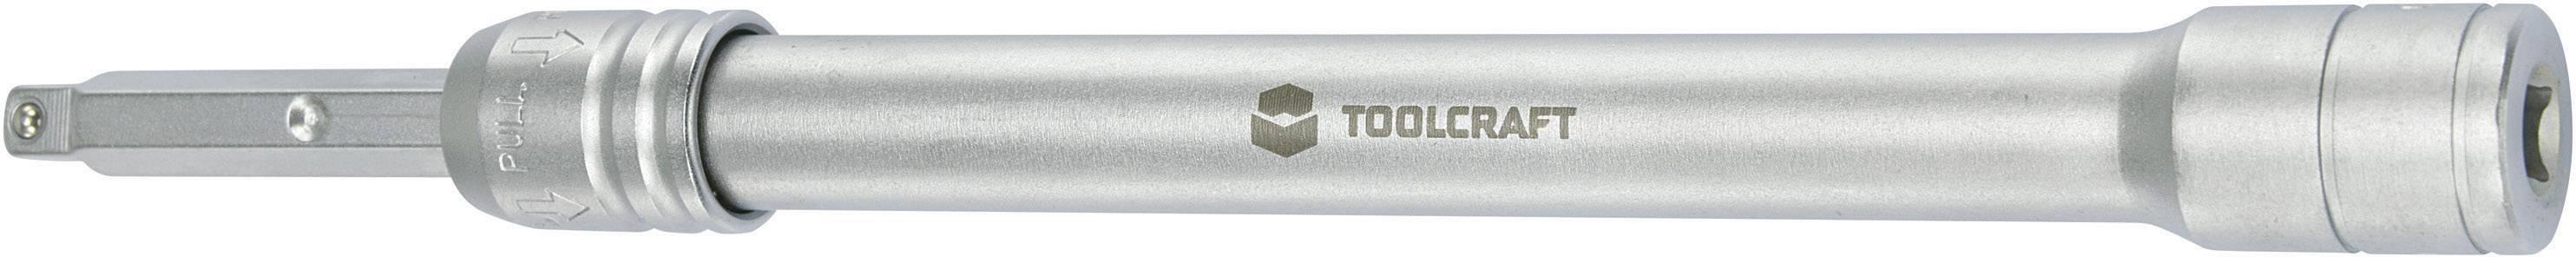 TOOLCRAFT 824298, 195 mm